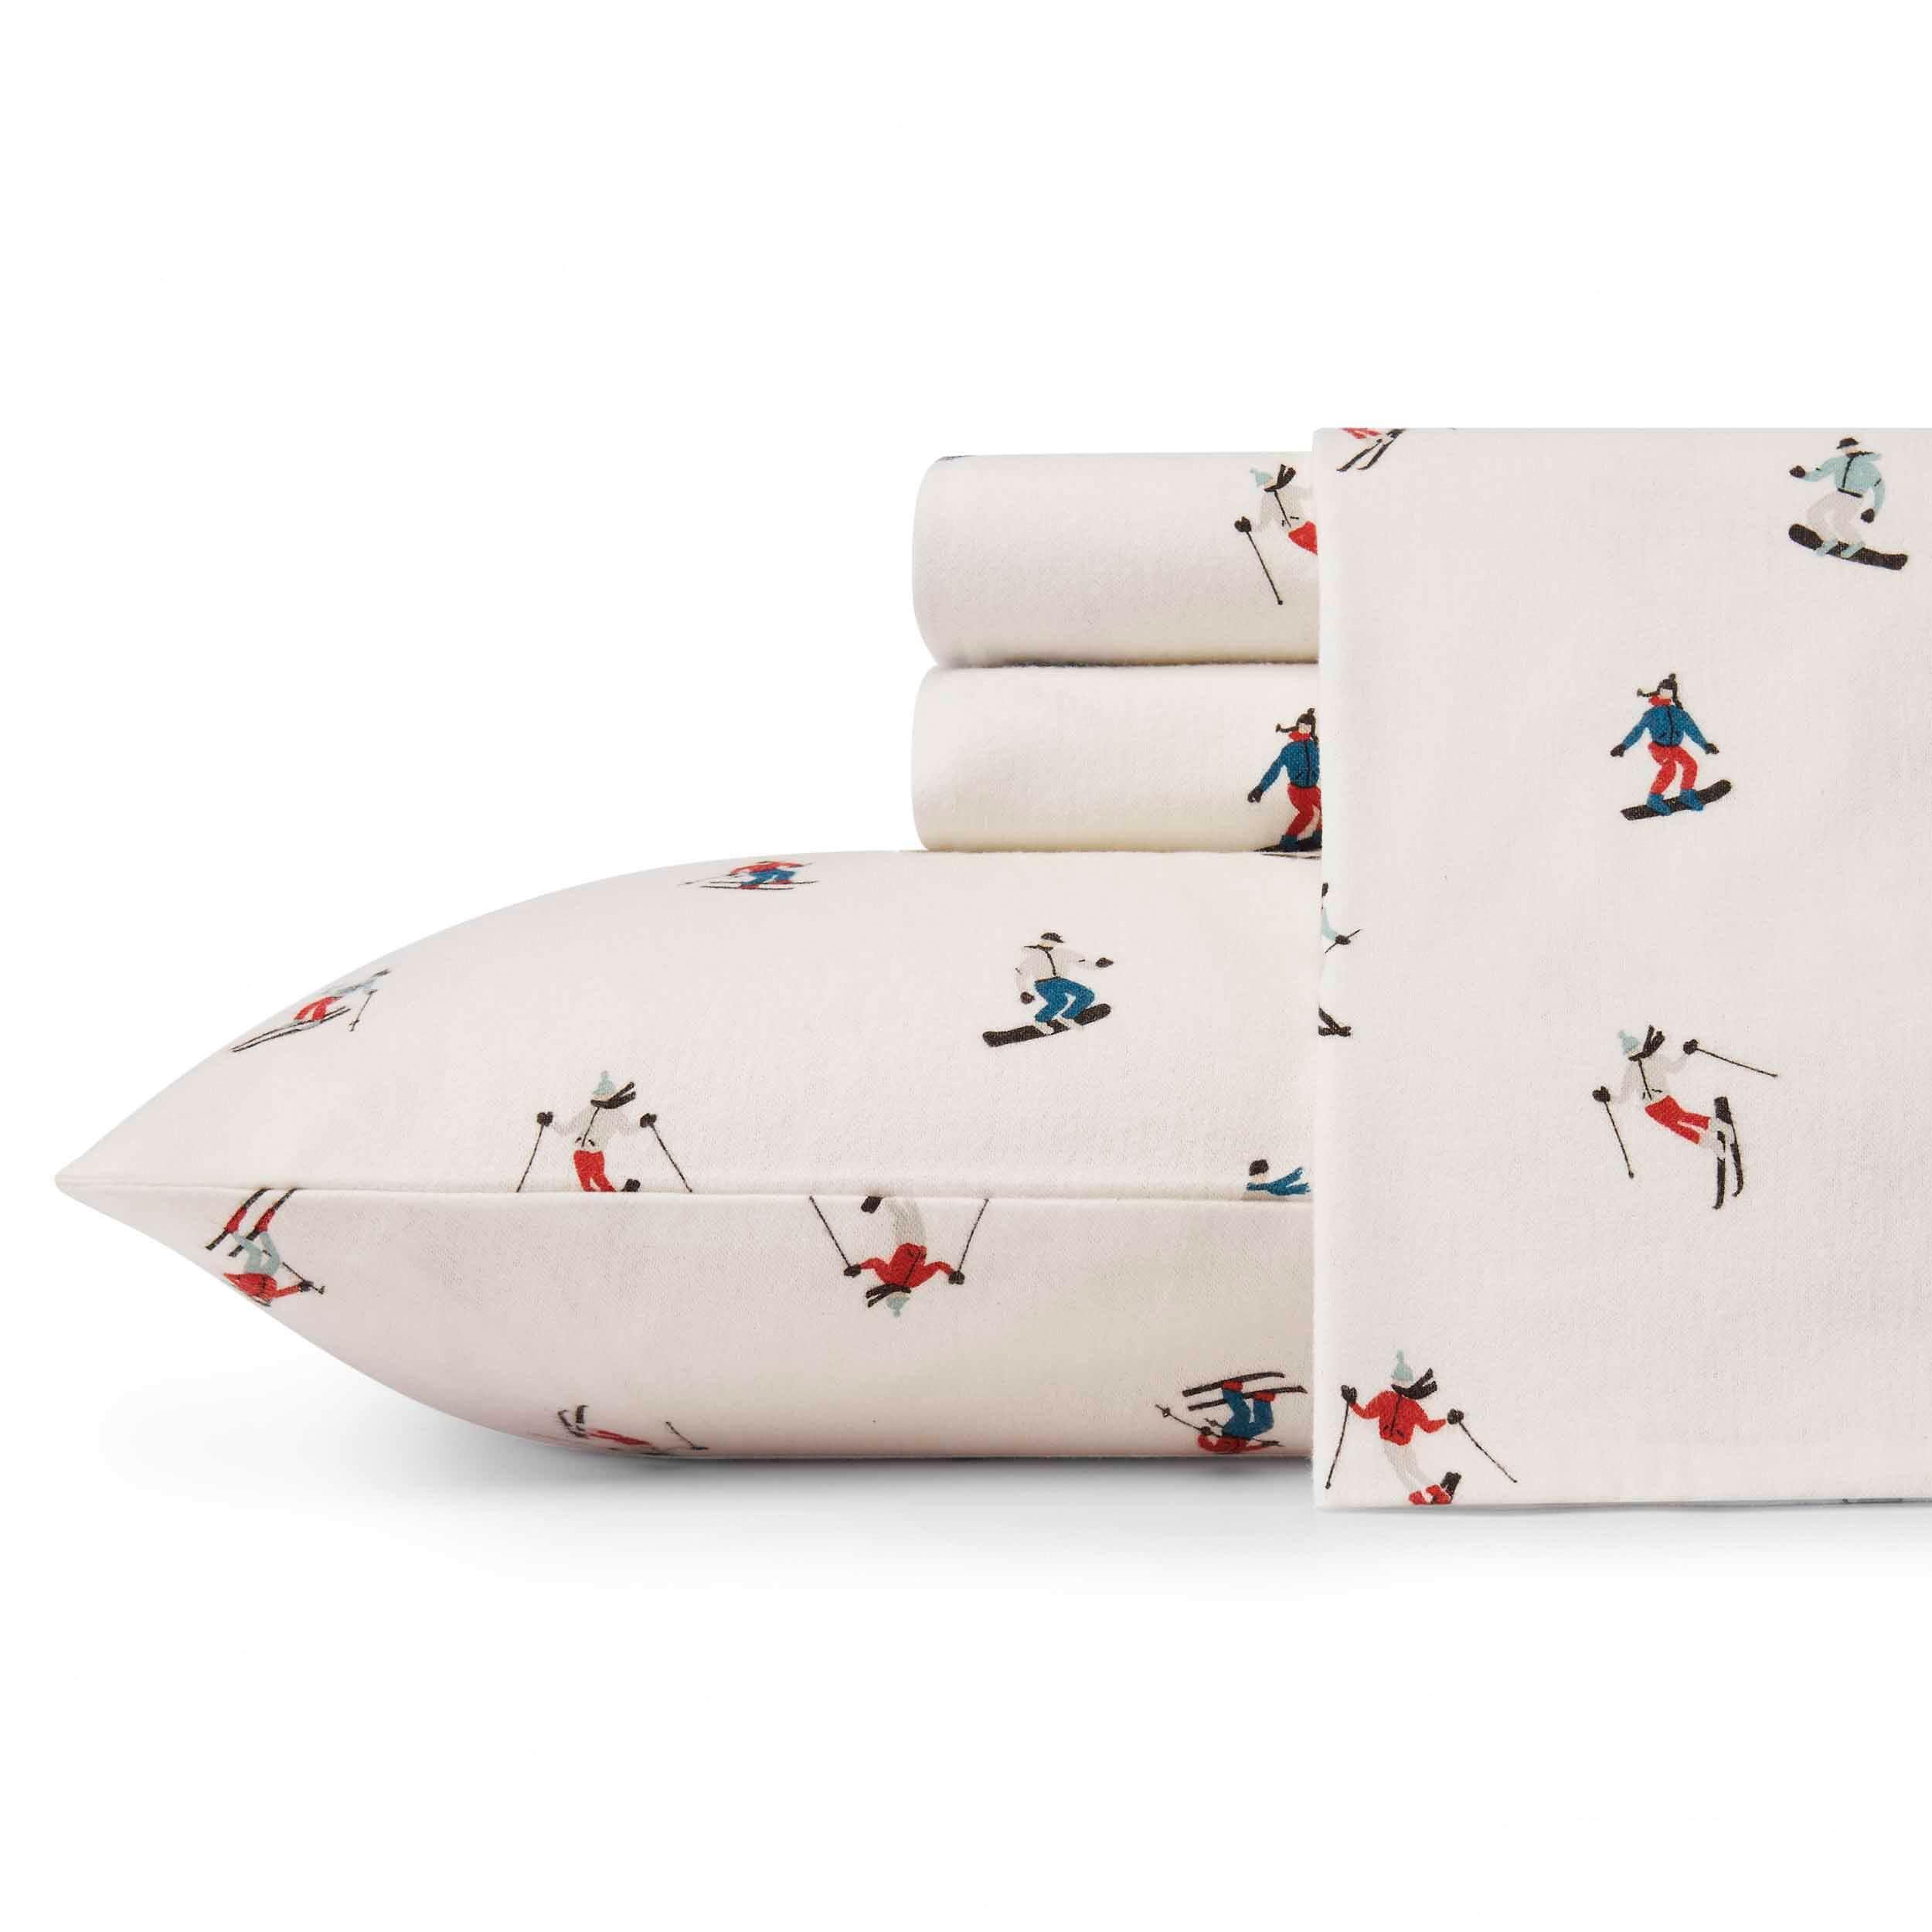 Eddie Bauer Cotton Flannel Bed Sheet Sets On Sale Overstock 8247214